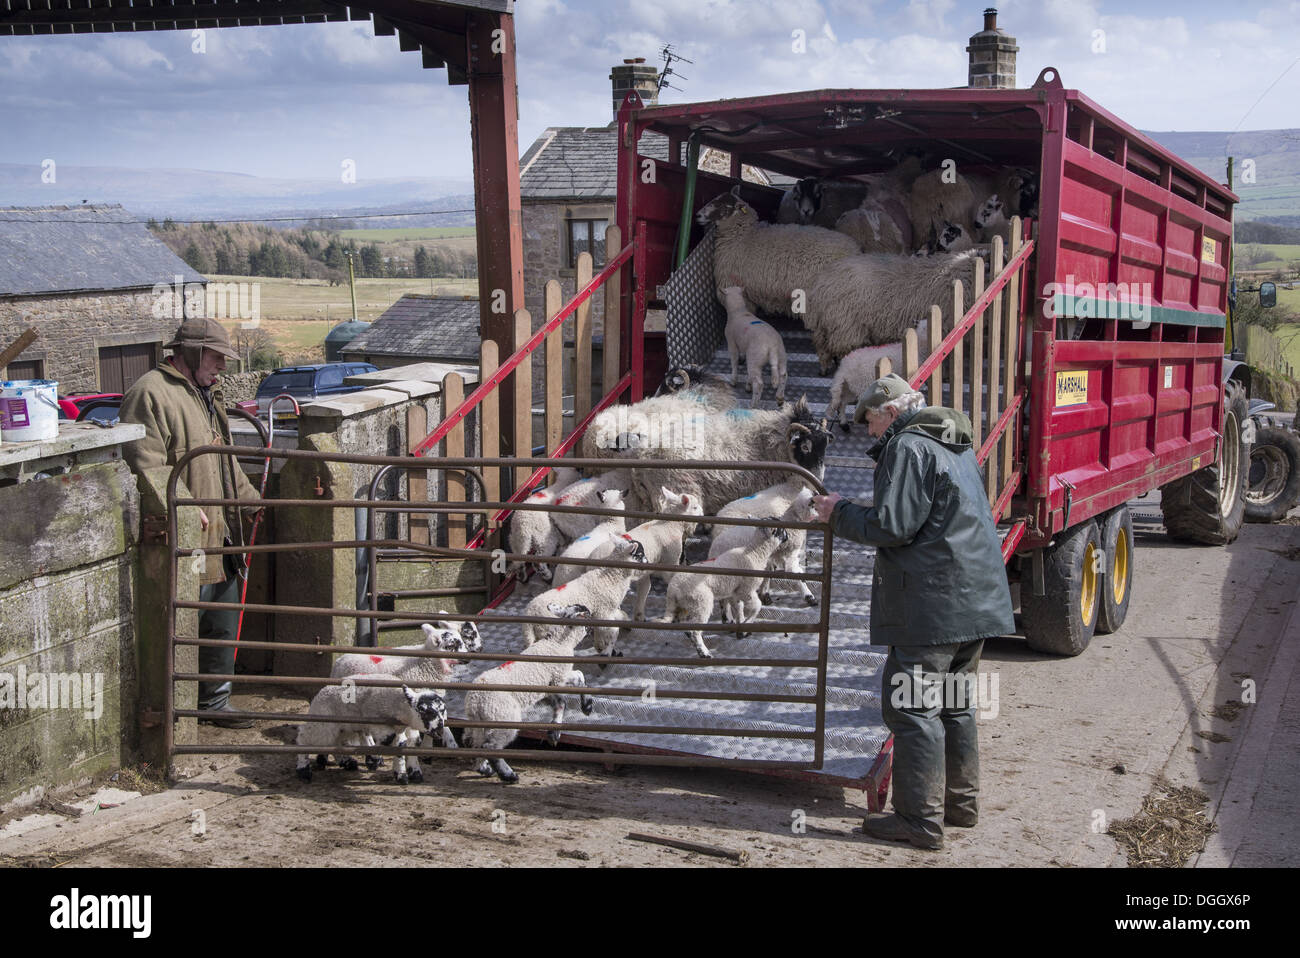 Sheep farming, farmers loading ewes and lambs onto livestock